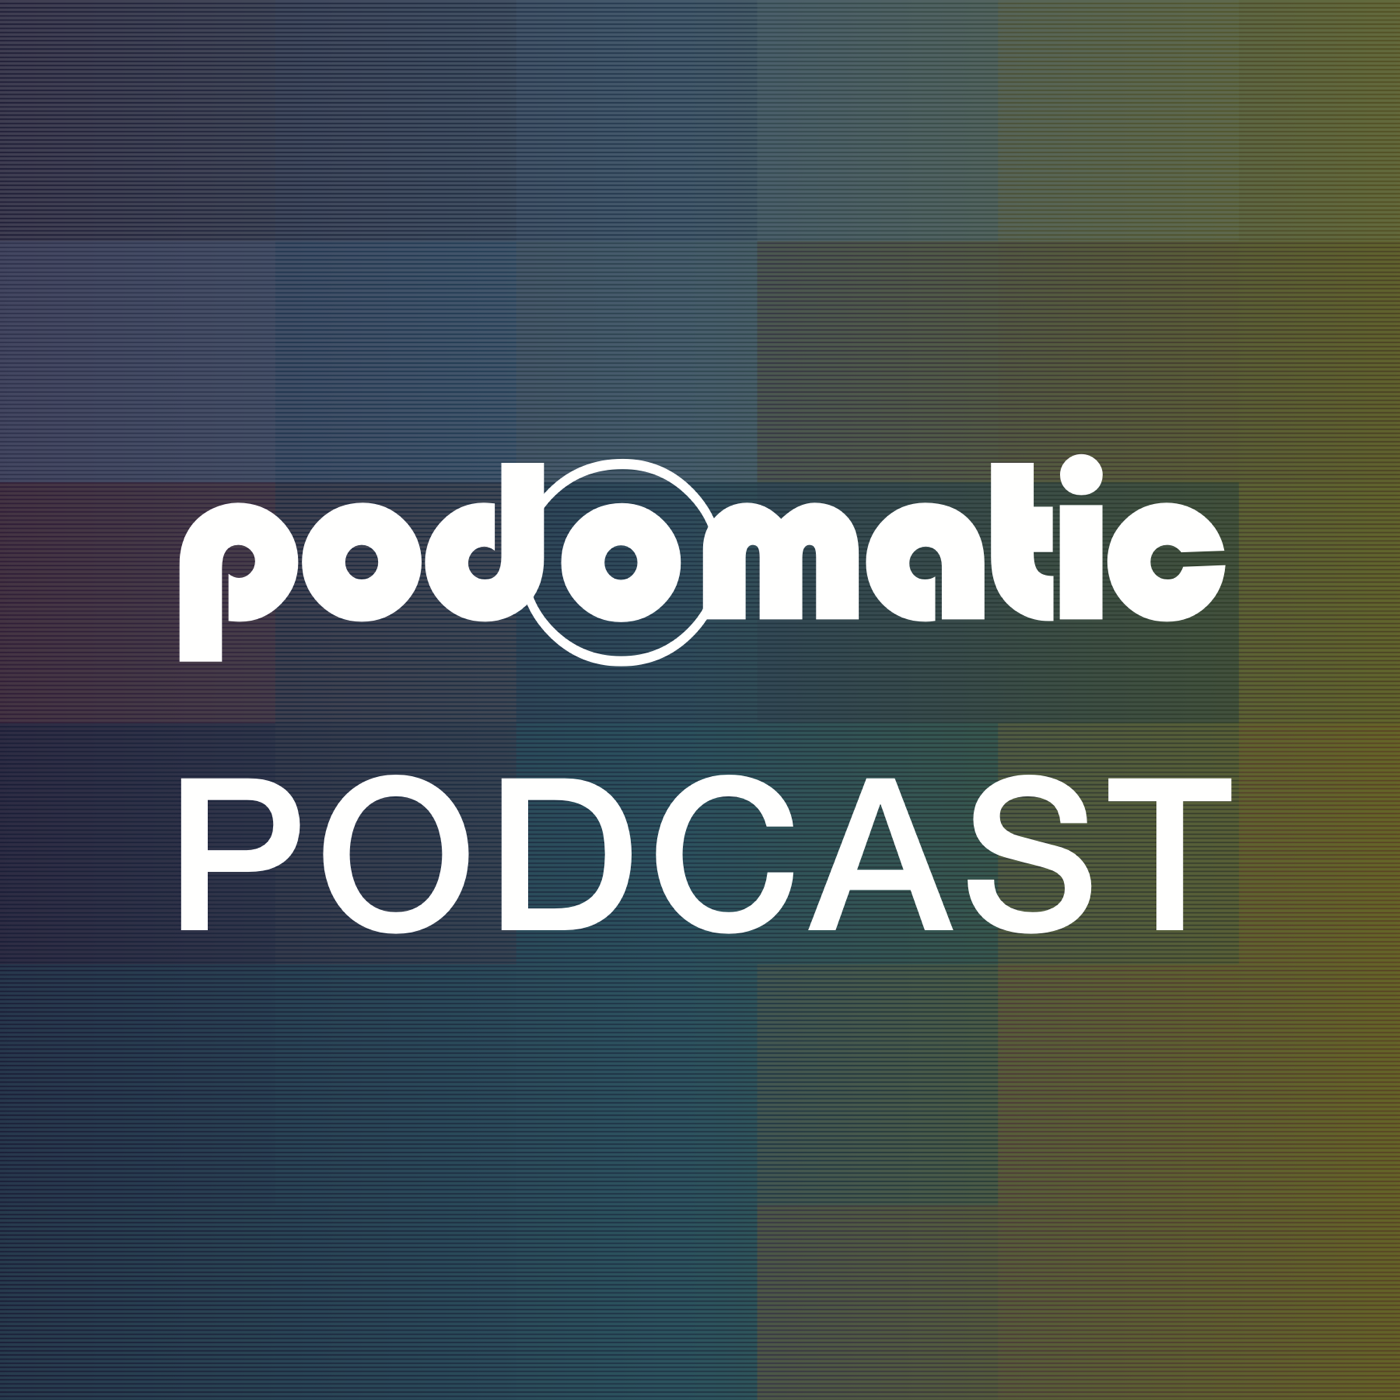 elliot-patterson's Podcast